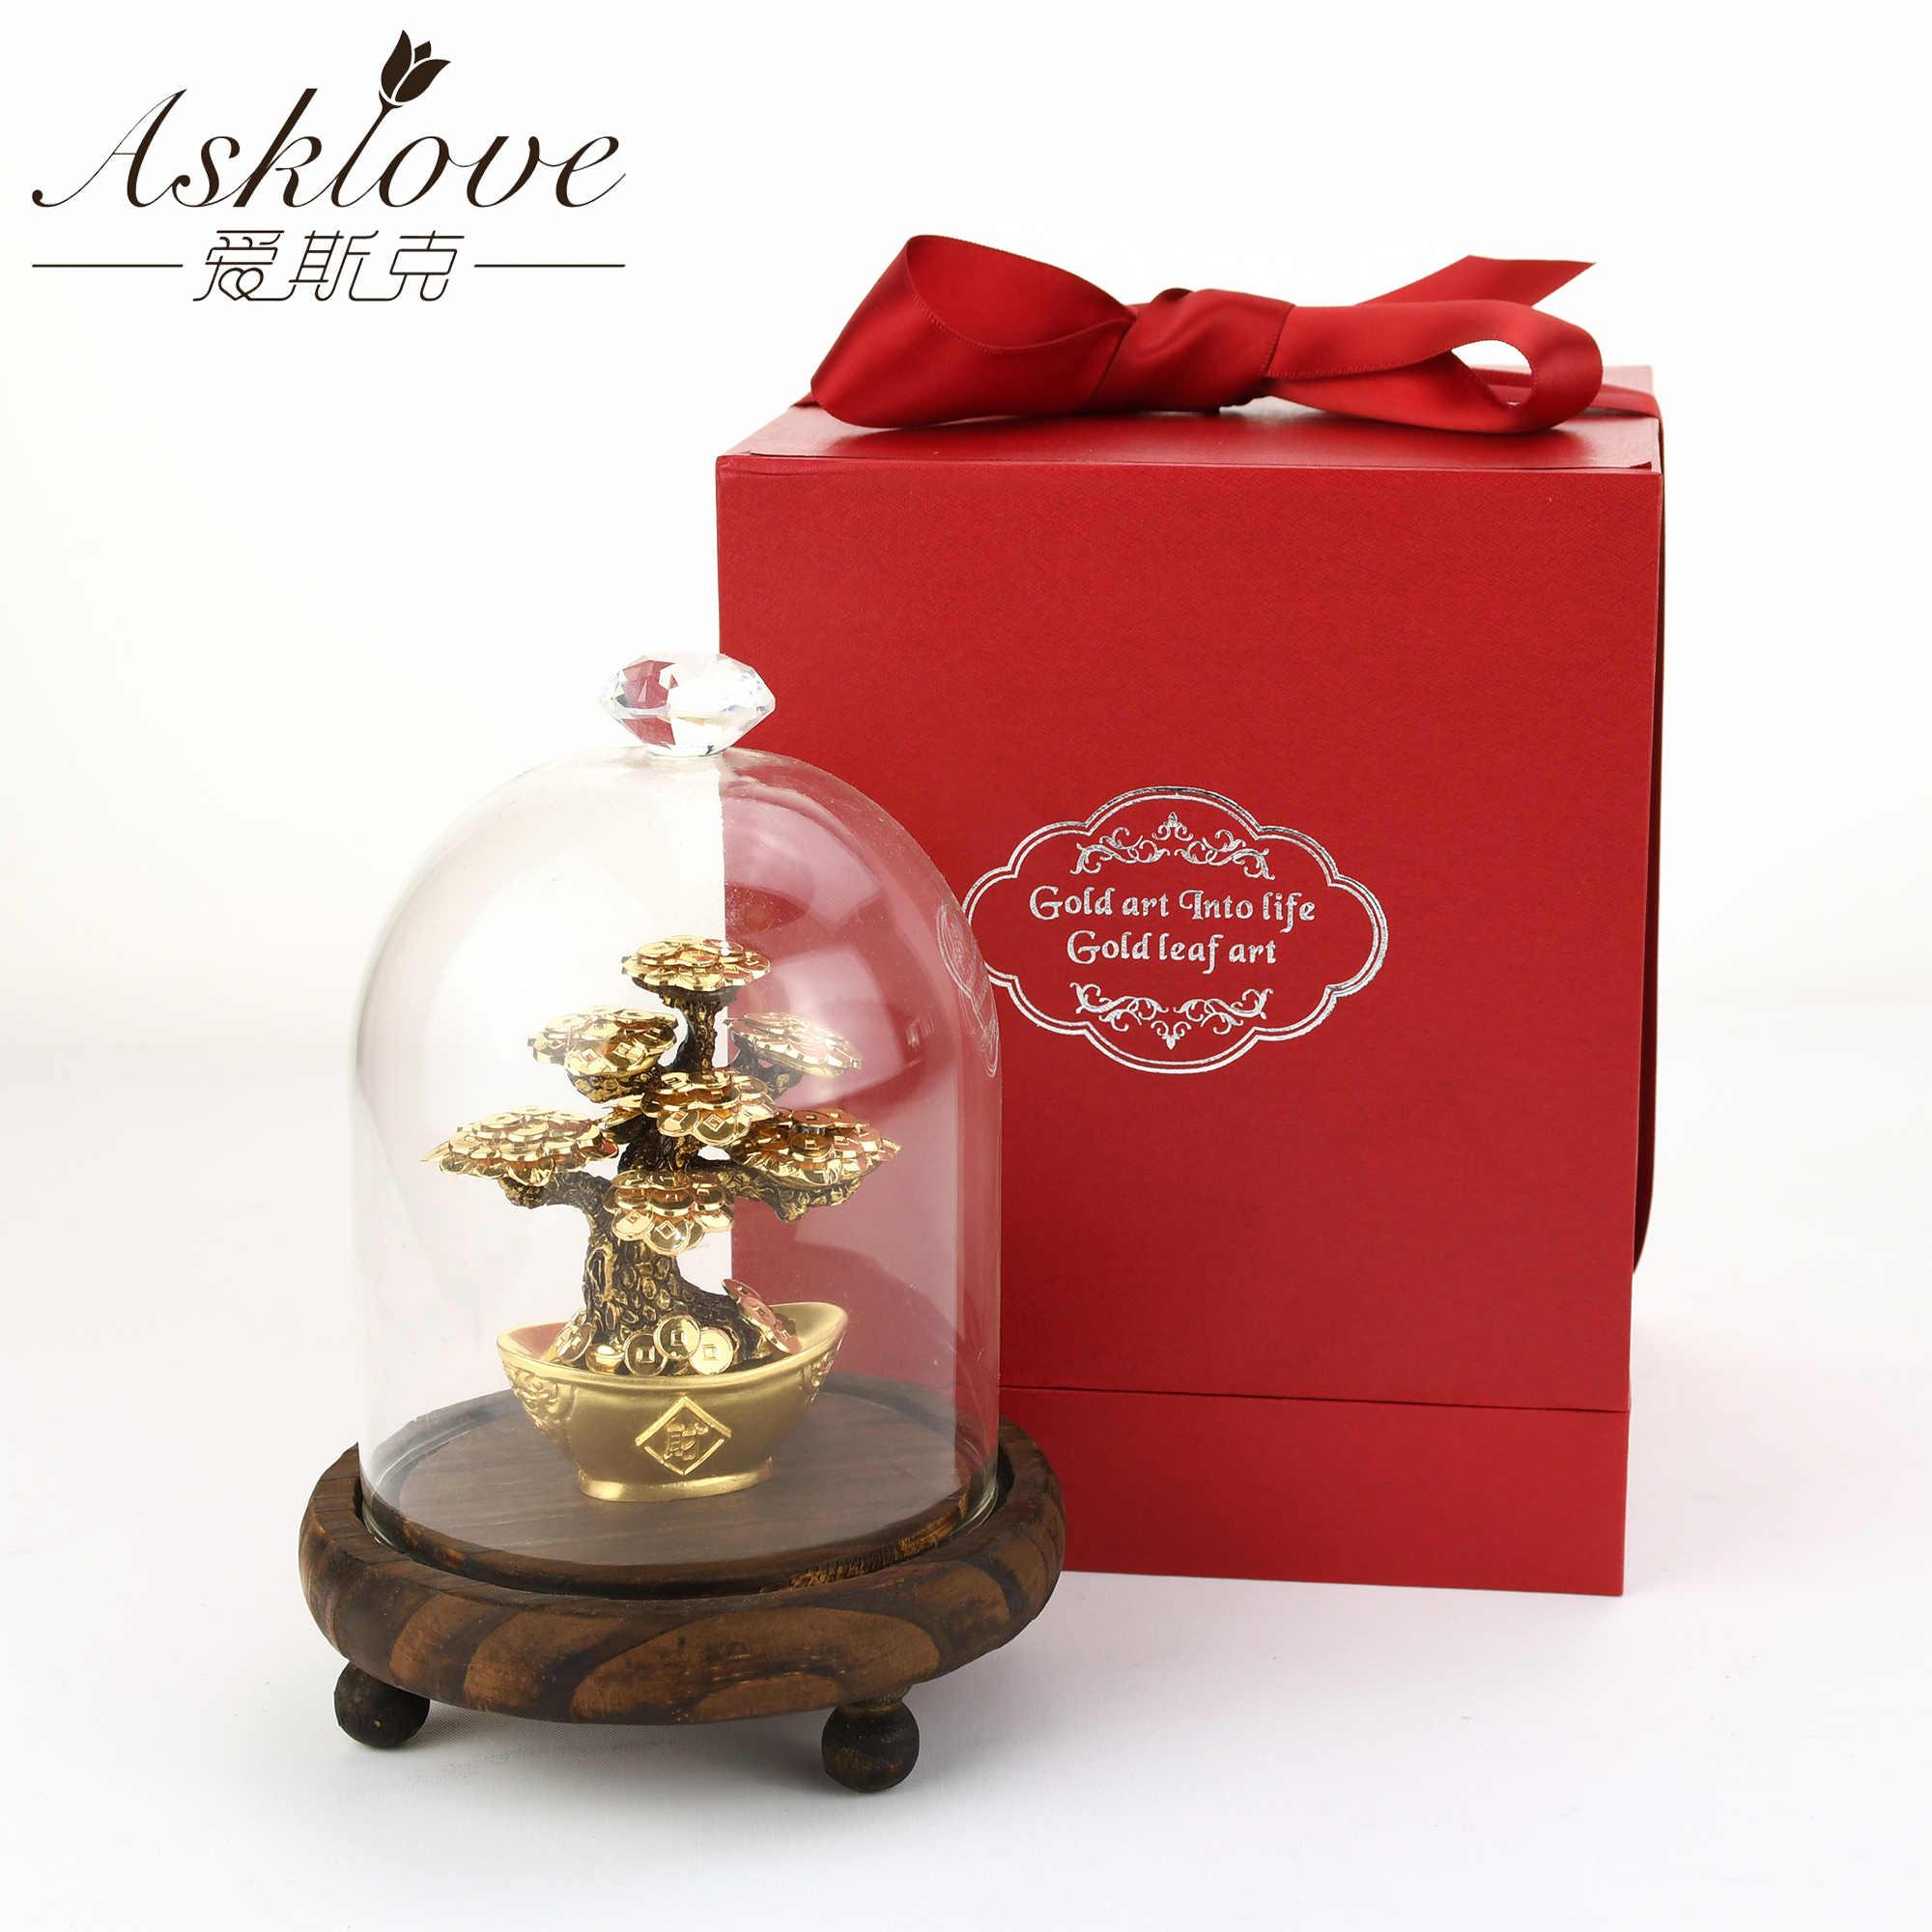 Feng Shui Fortune Tree ทองฟอยล์เงินต้นไม้ Bonsai Office Tabletop ความมั่งคั่งโชคดีเครื่องประดับของขวัญตกแต่งของขวัญกล่อง